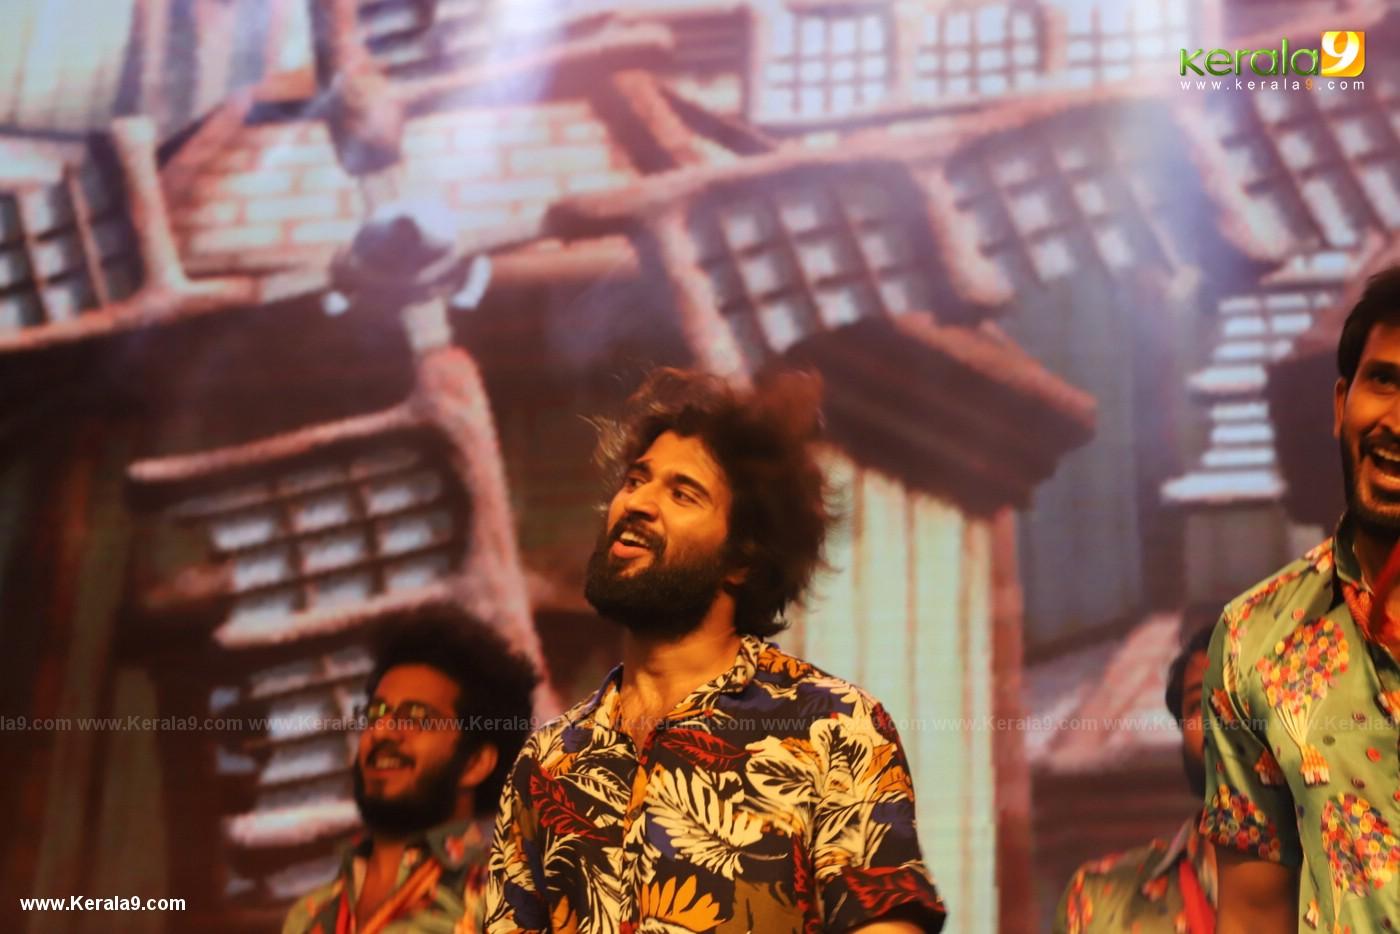 Dear Comrade movie premotion kerala kochi photos 064 - Kerala9.com